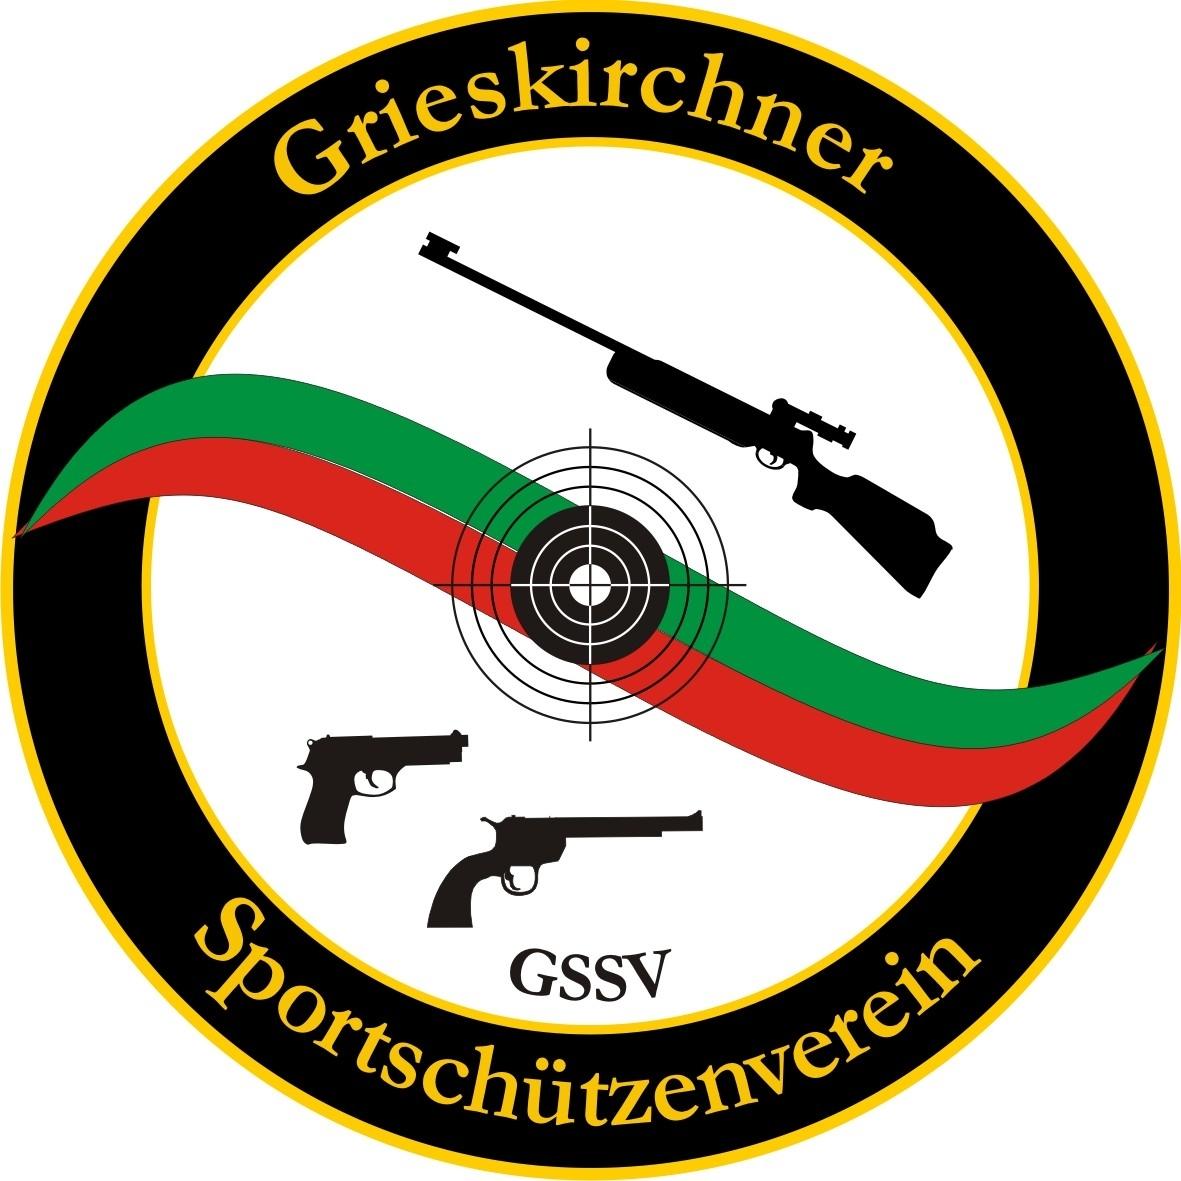 GSSV Grieskirchen